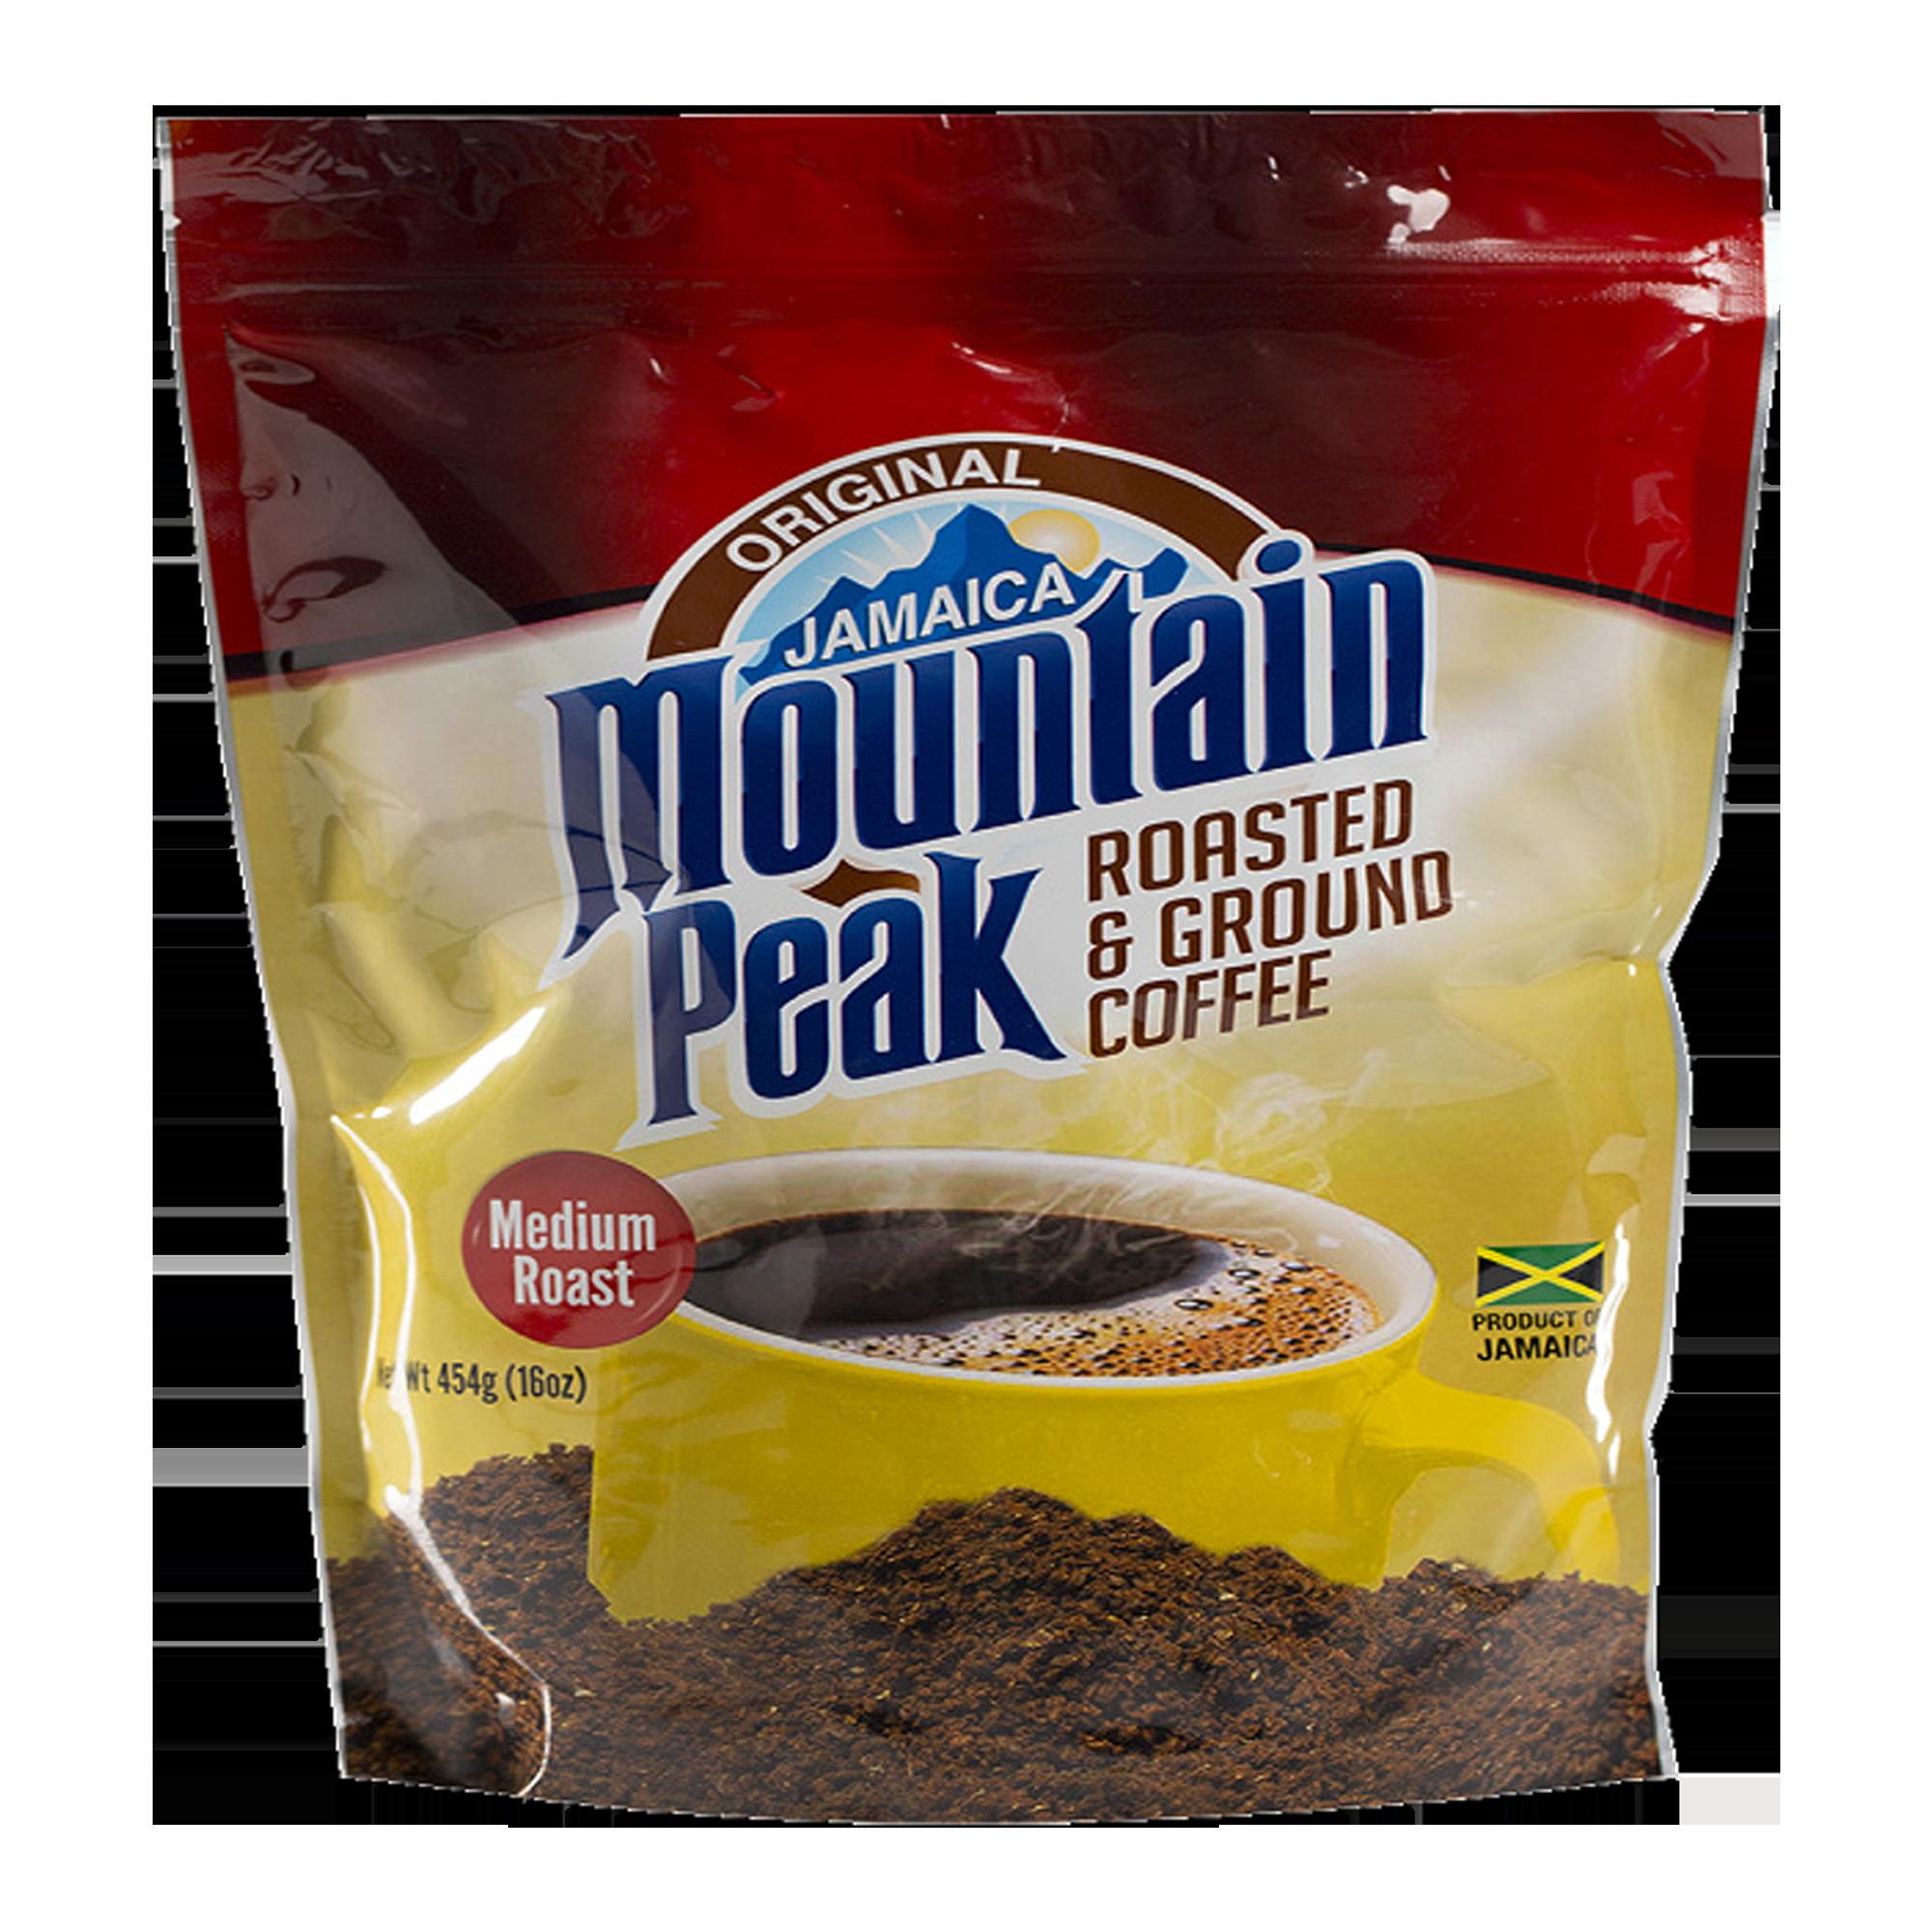 Jamaica Mountain Peak Roasted & Ground Coffee